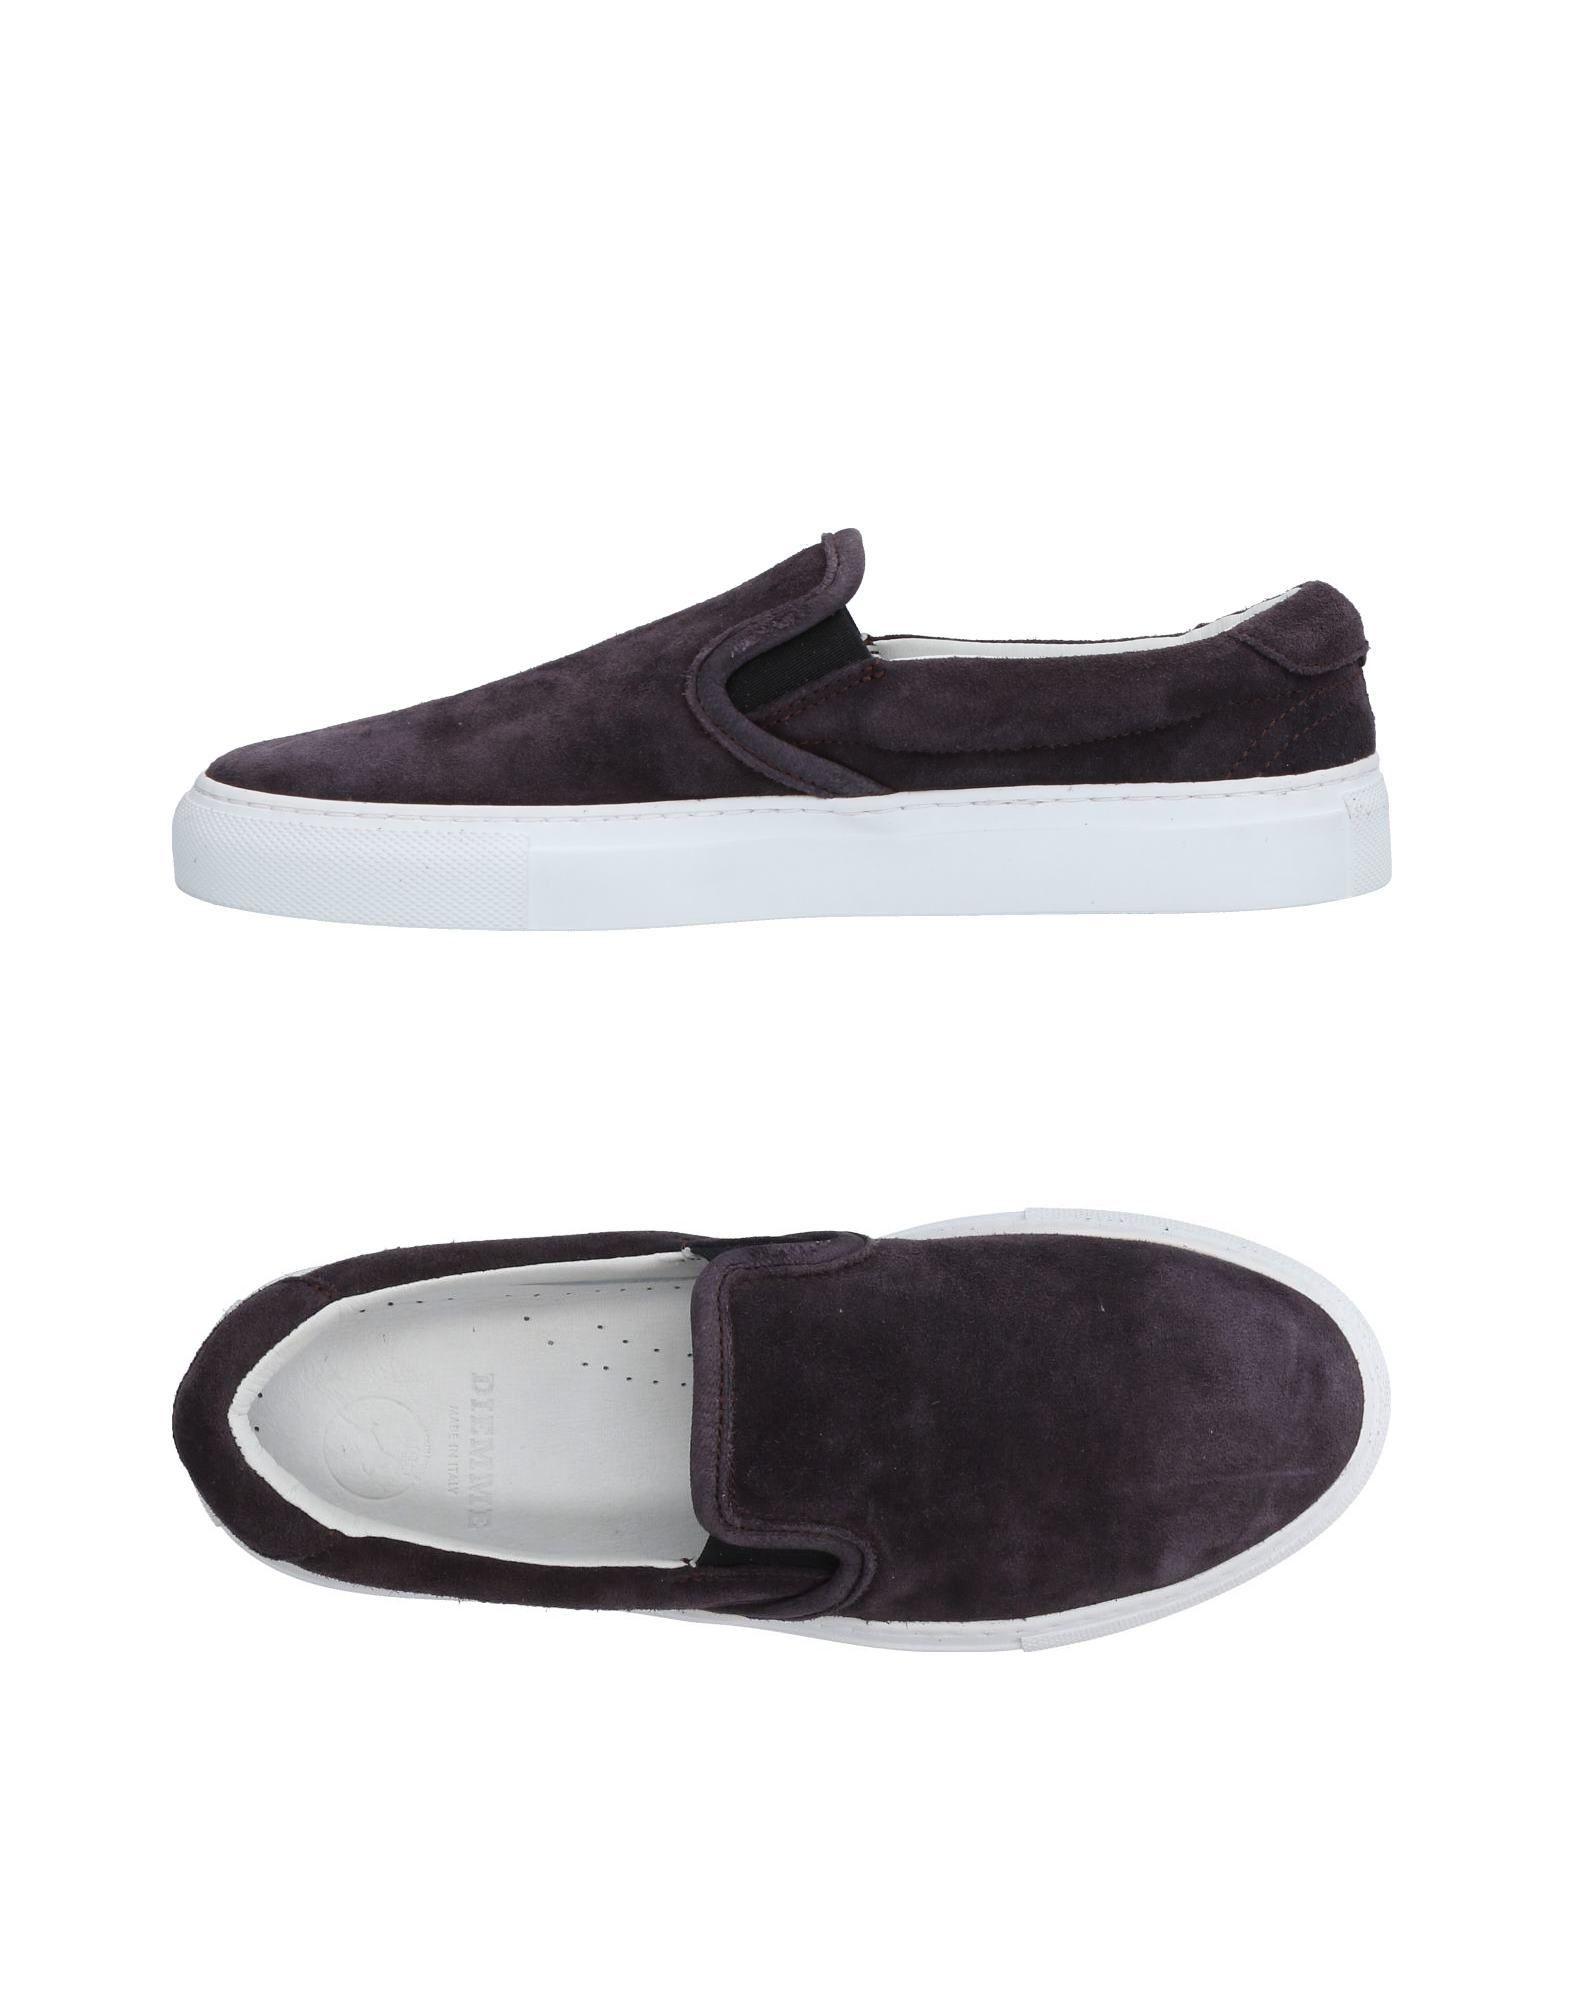 Moda Sneakers Diemme Uomo - 11507429QD